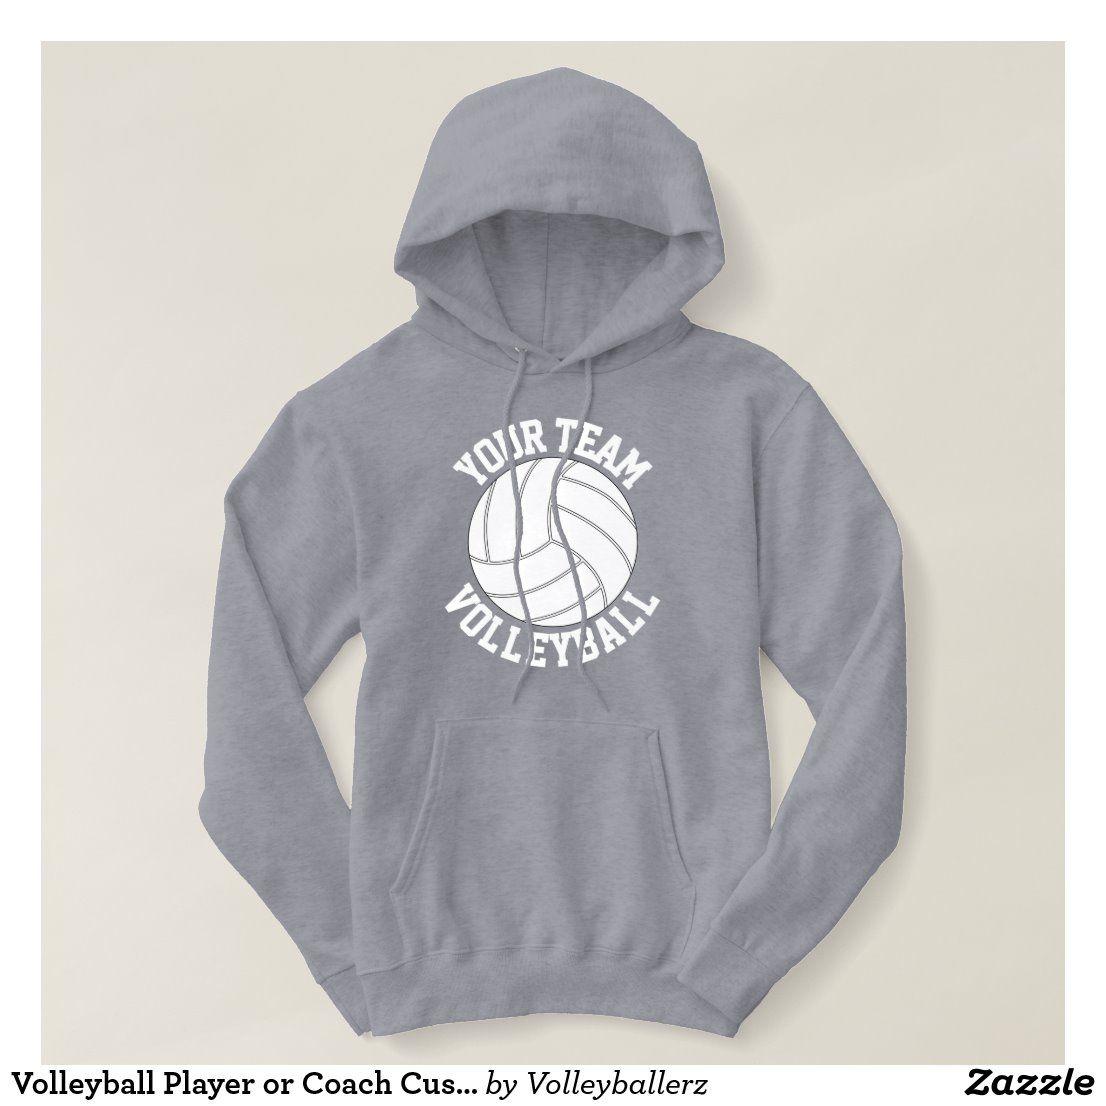 Volleyball Player Or Coach Custom Team Name Sports Hoodie Zazzle Com In 2020 Sports Hoodies Hoodies Hoodies Womens